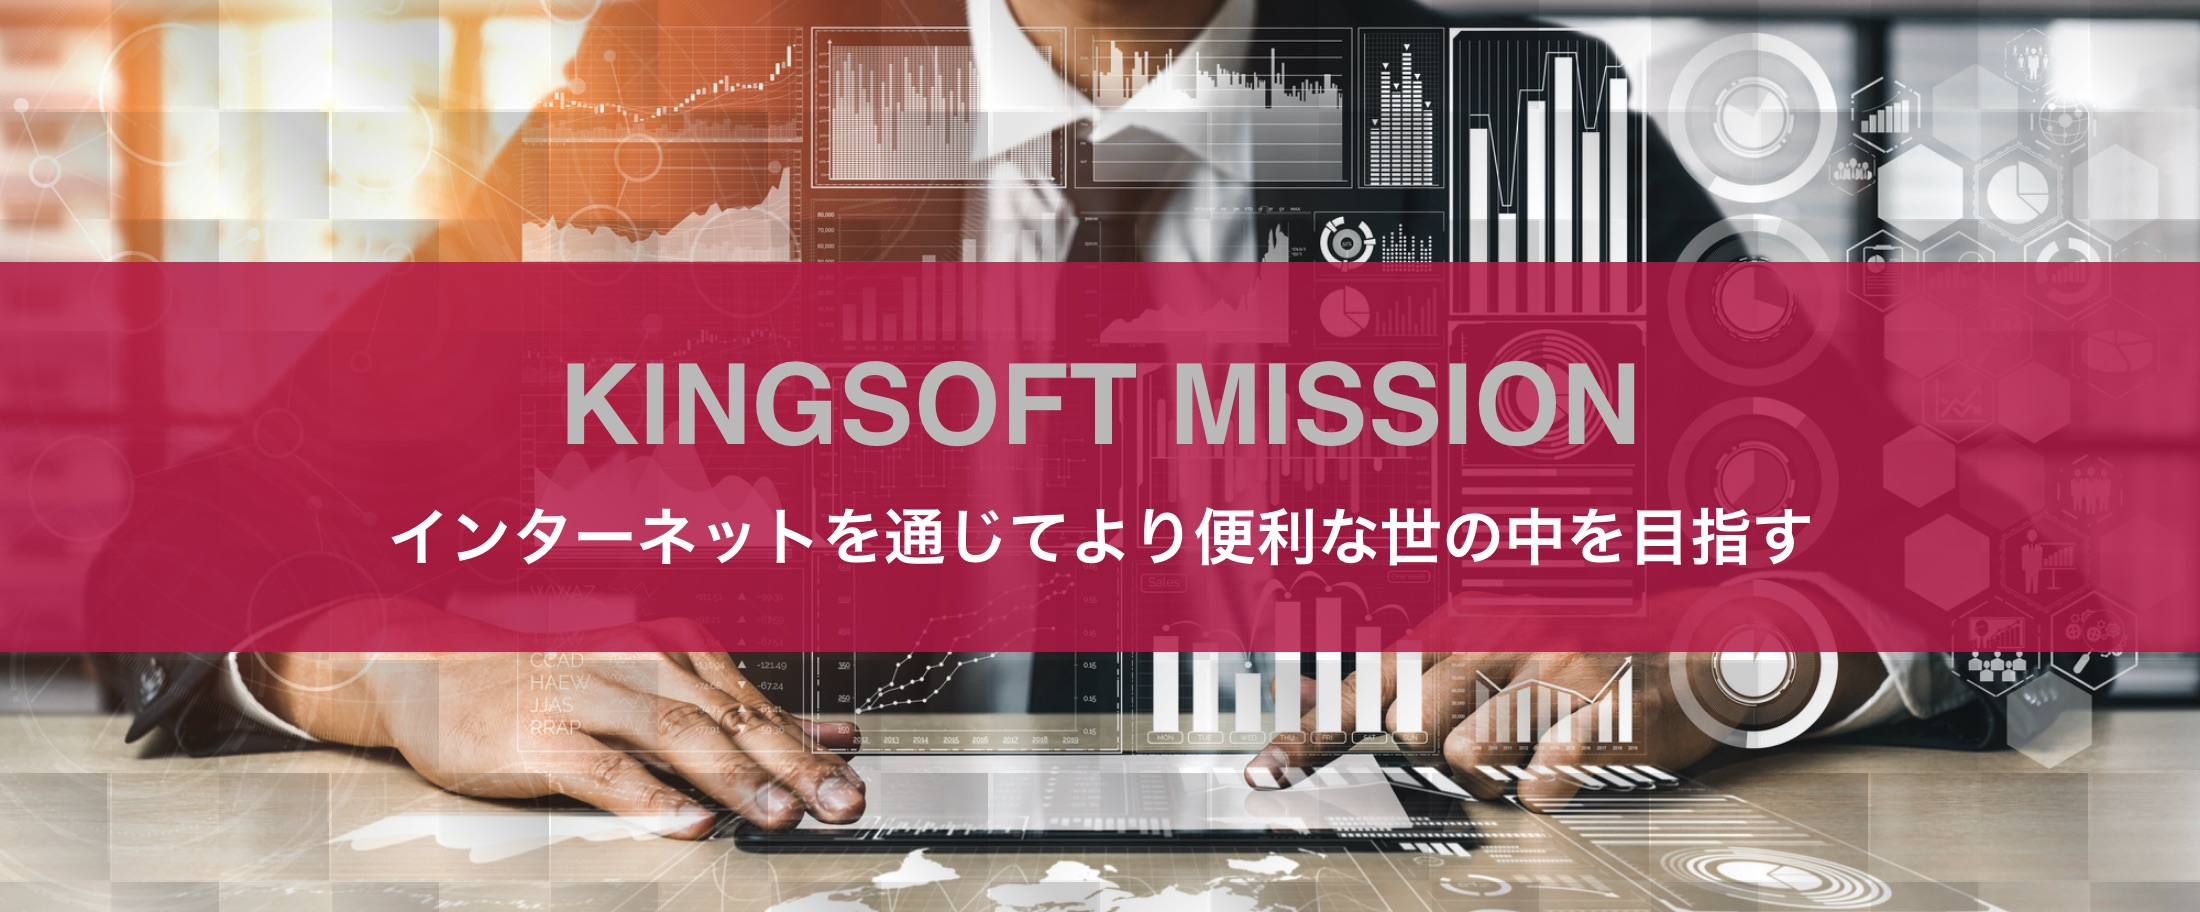 KINGSOFT MISSION